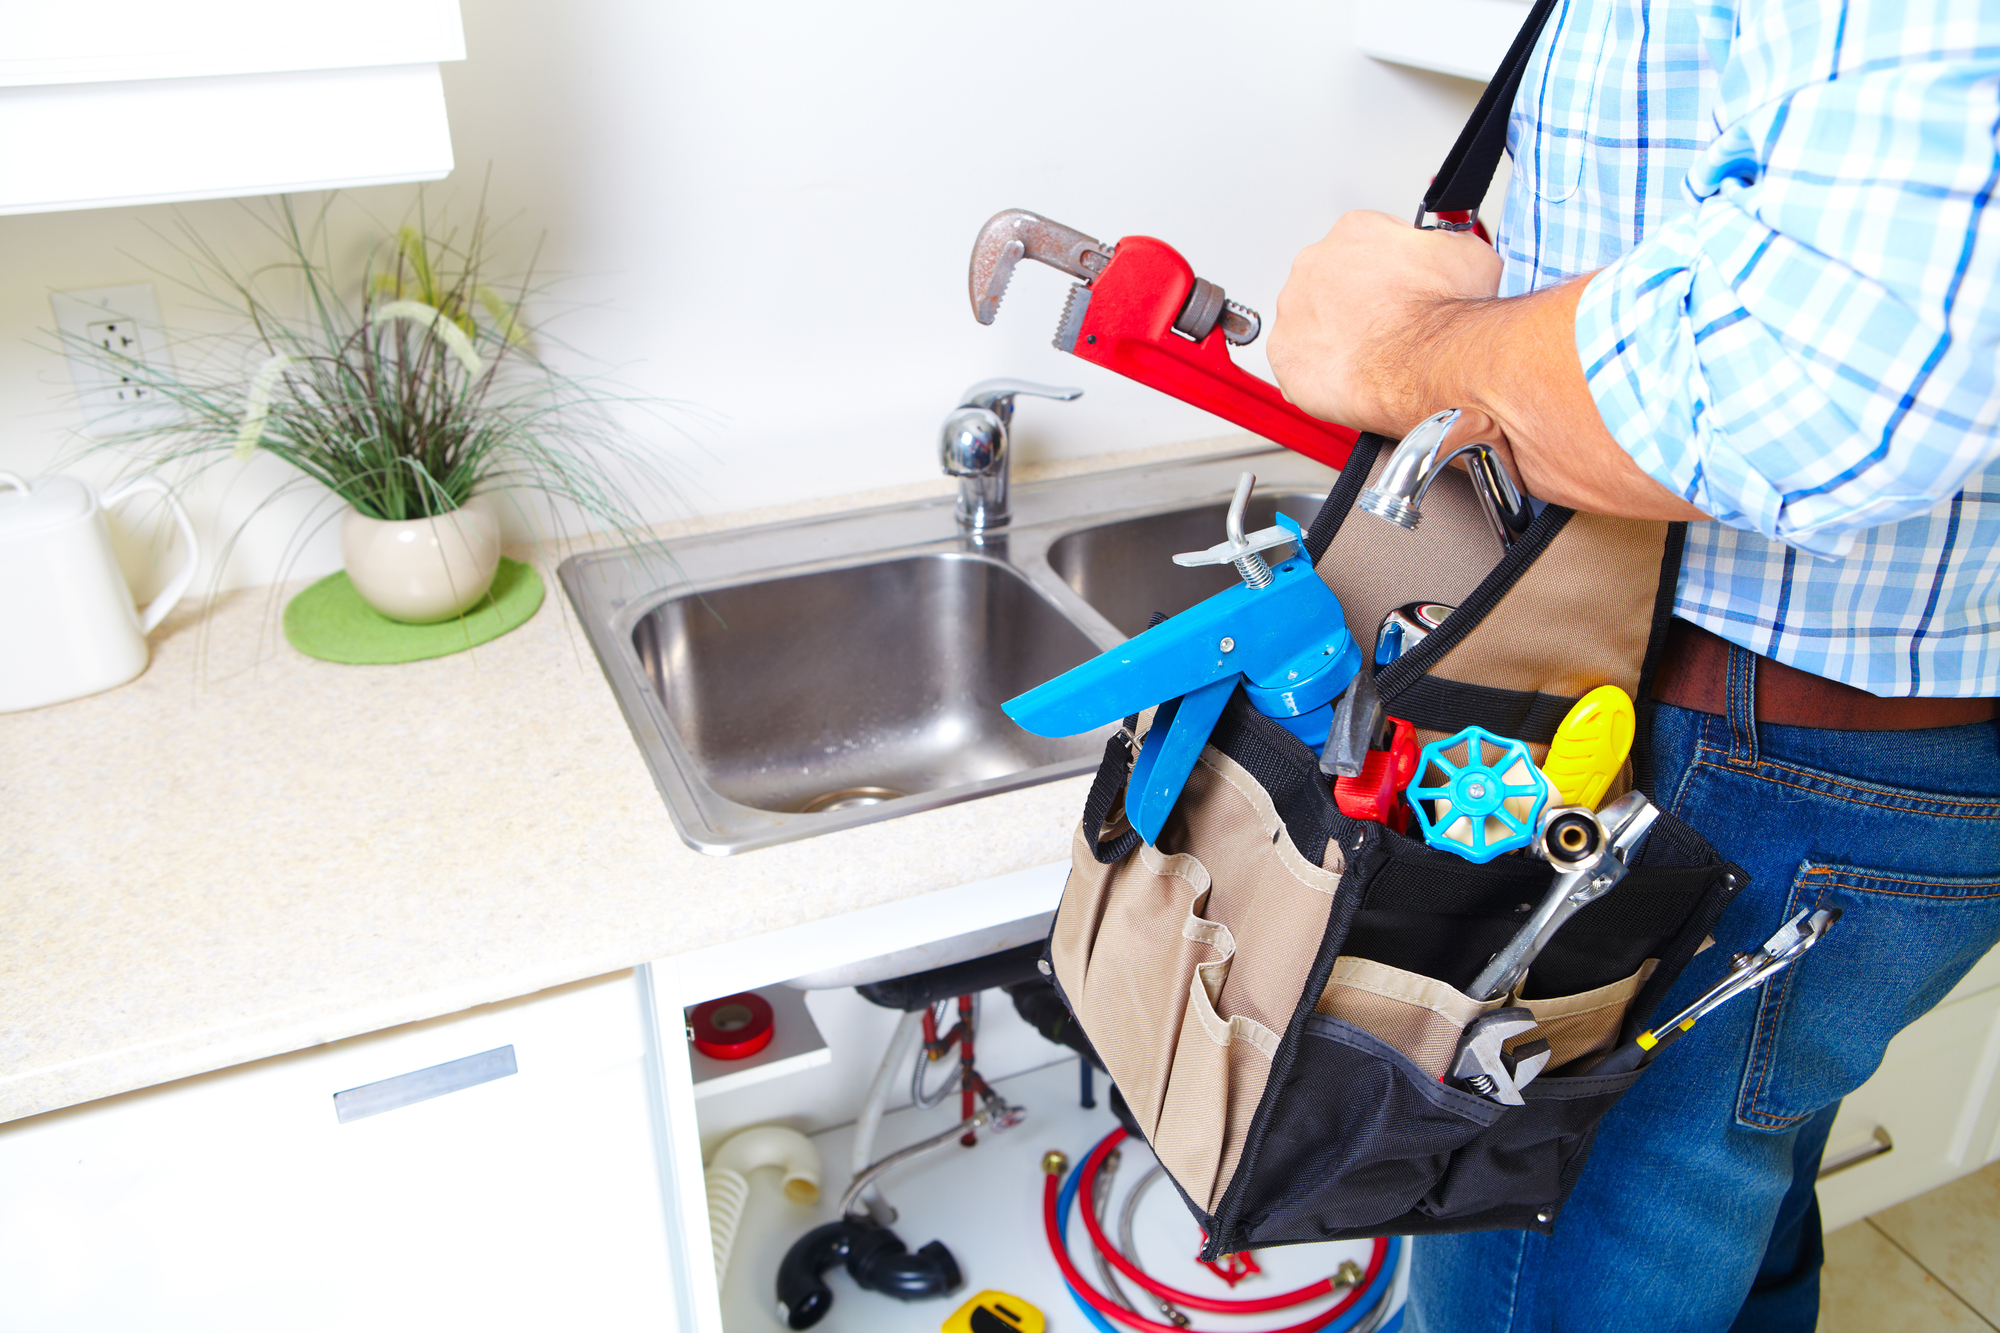 Plumber on the kitchen